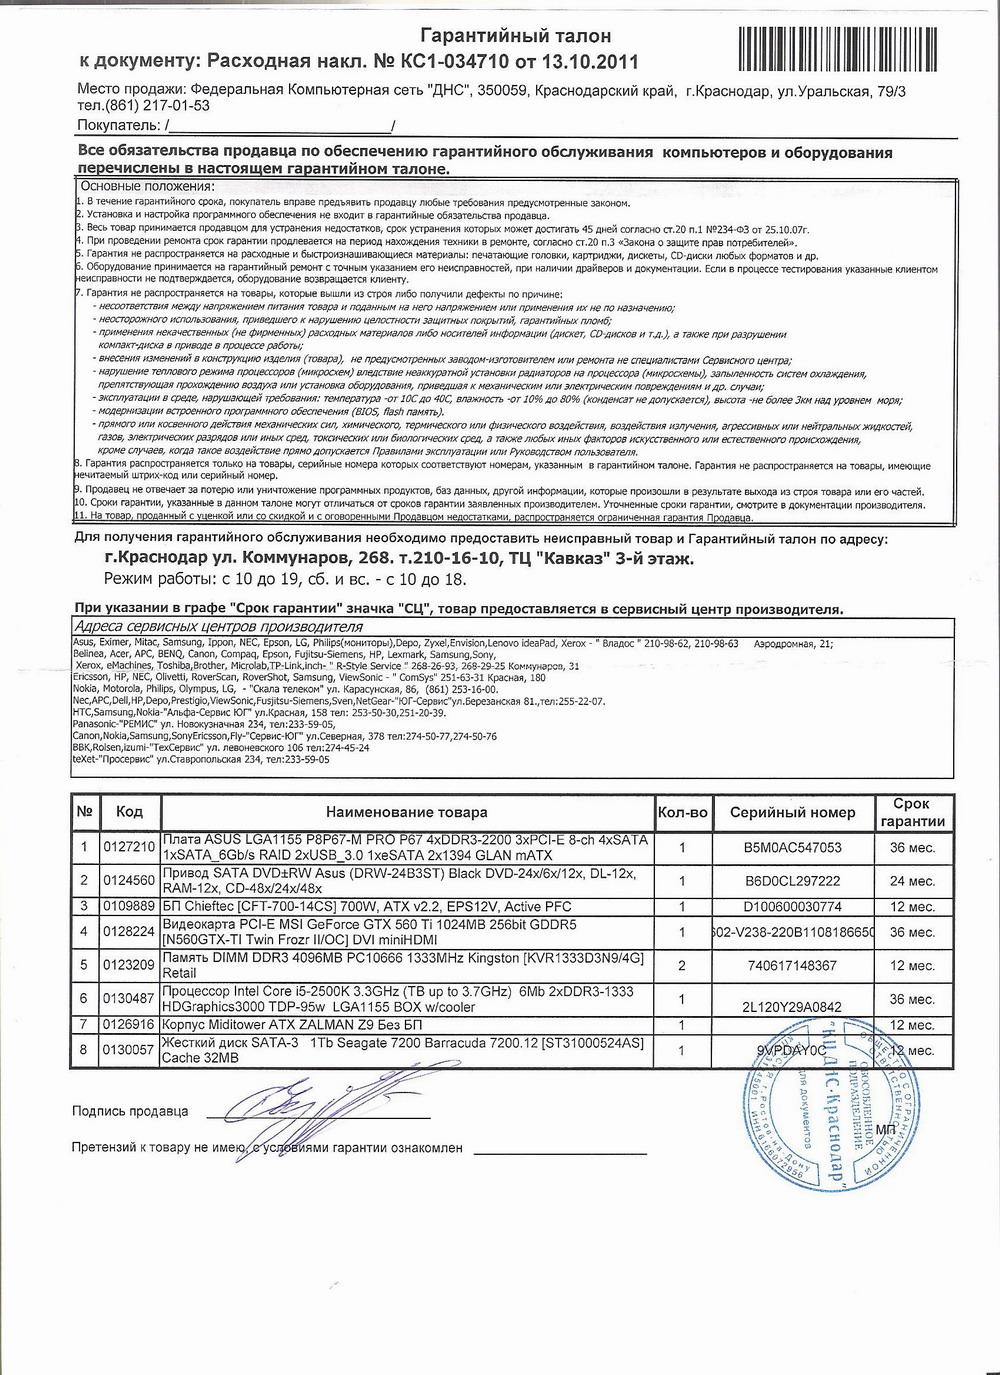 trans-pogran-uslugi-voronezh